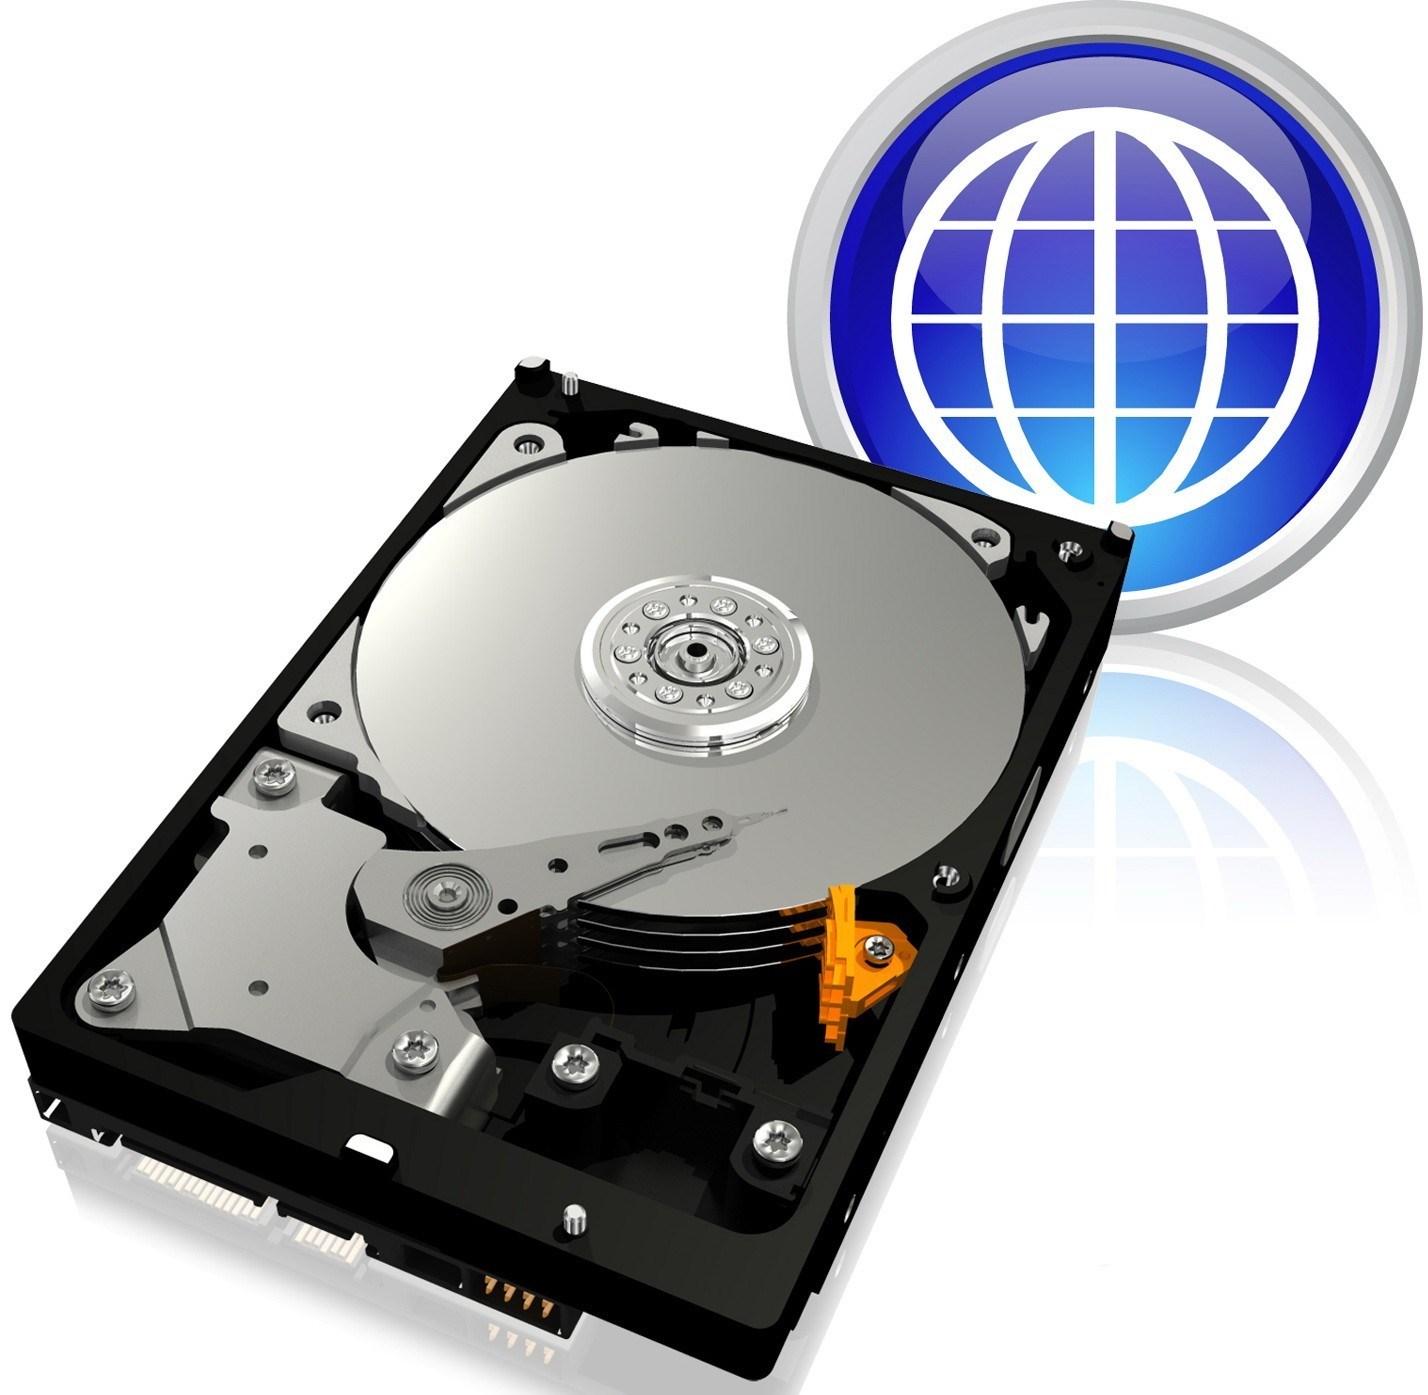 Western Digital Blue Wd10ezrz 1tb 35 Sata 60gb S Hard Drive Harddisk Wb Hardisk Laptop